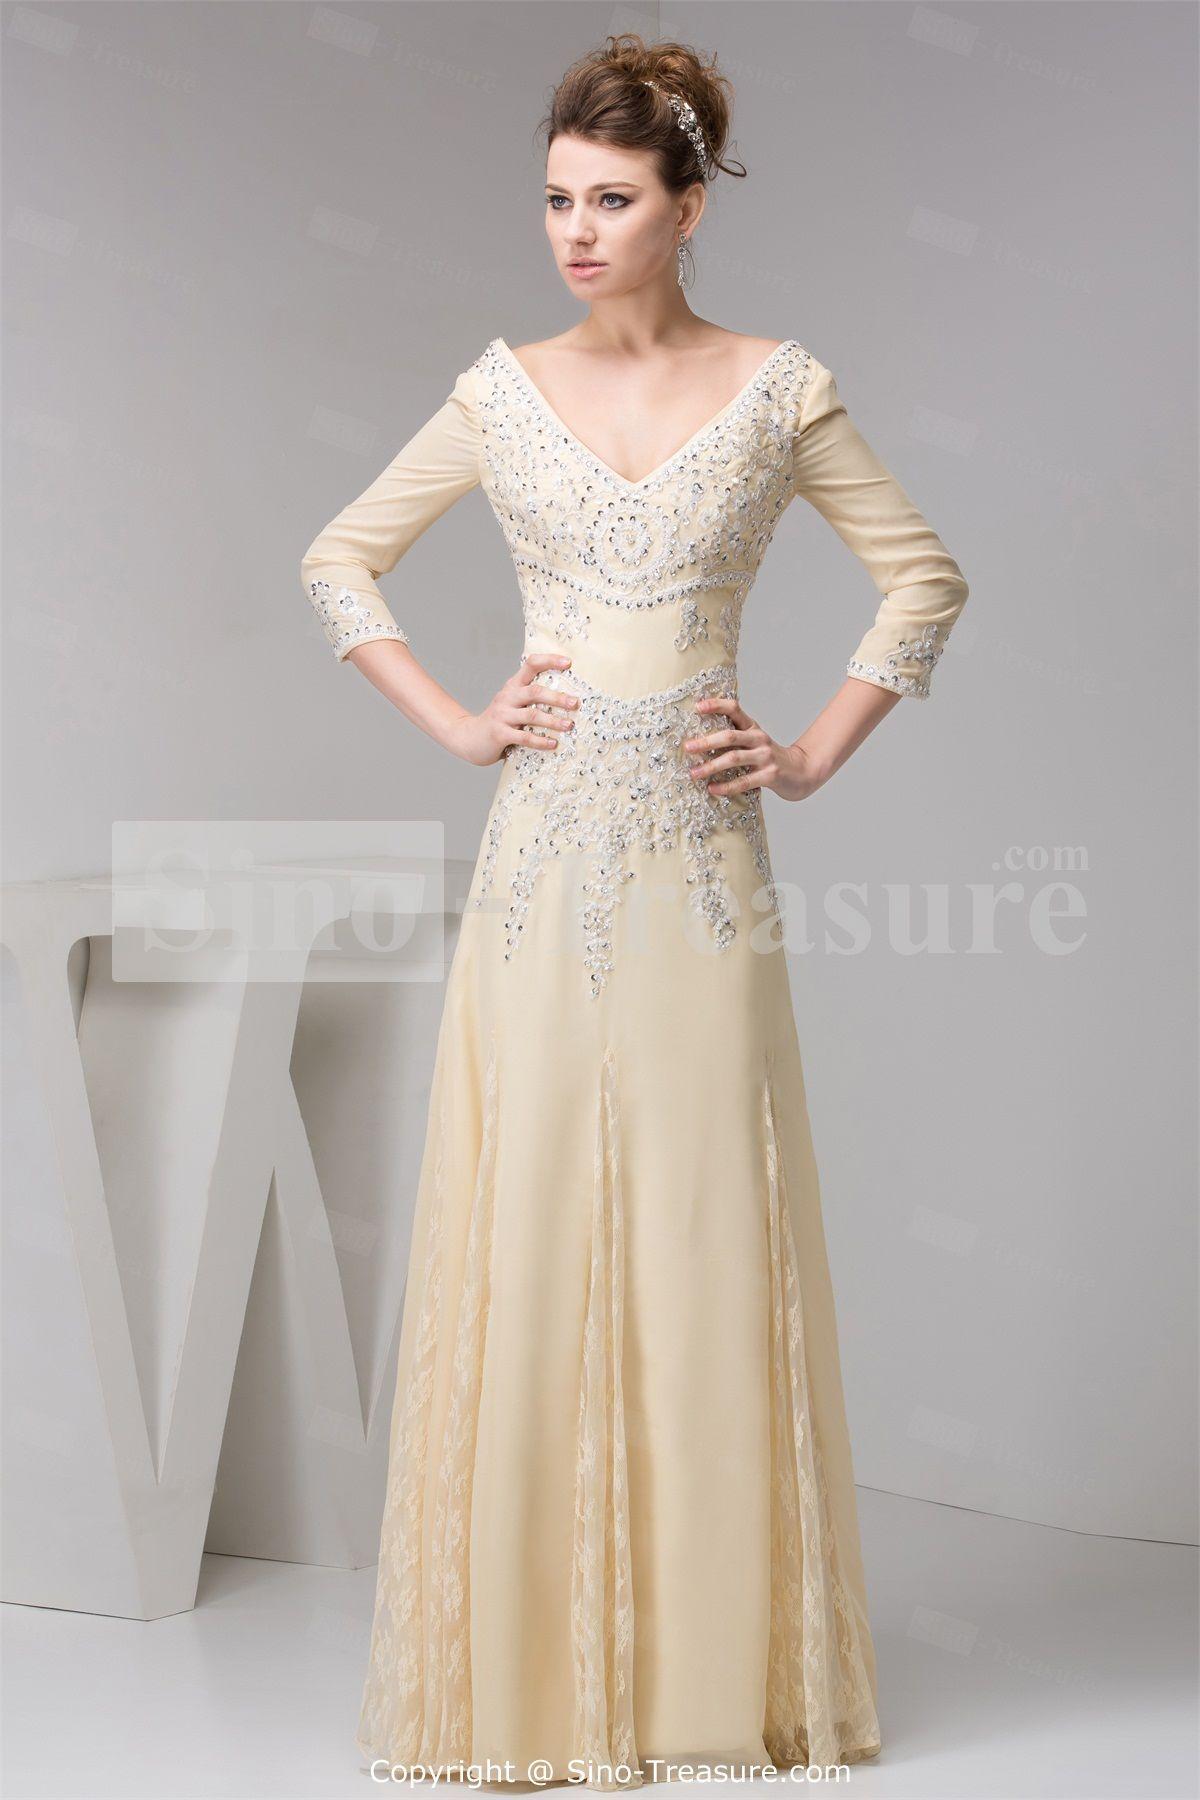 Amazing Long Sleeve Evening Dresses Beige V Neck Long